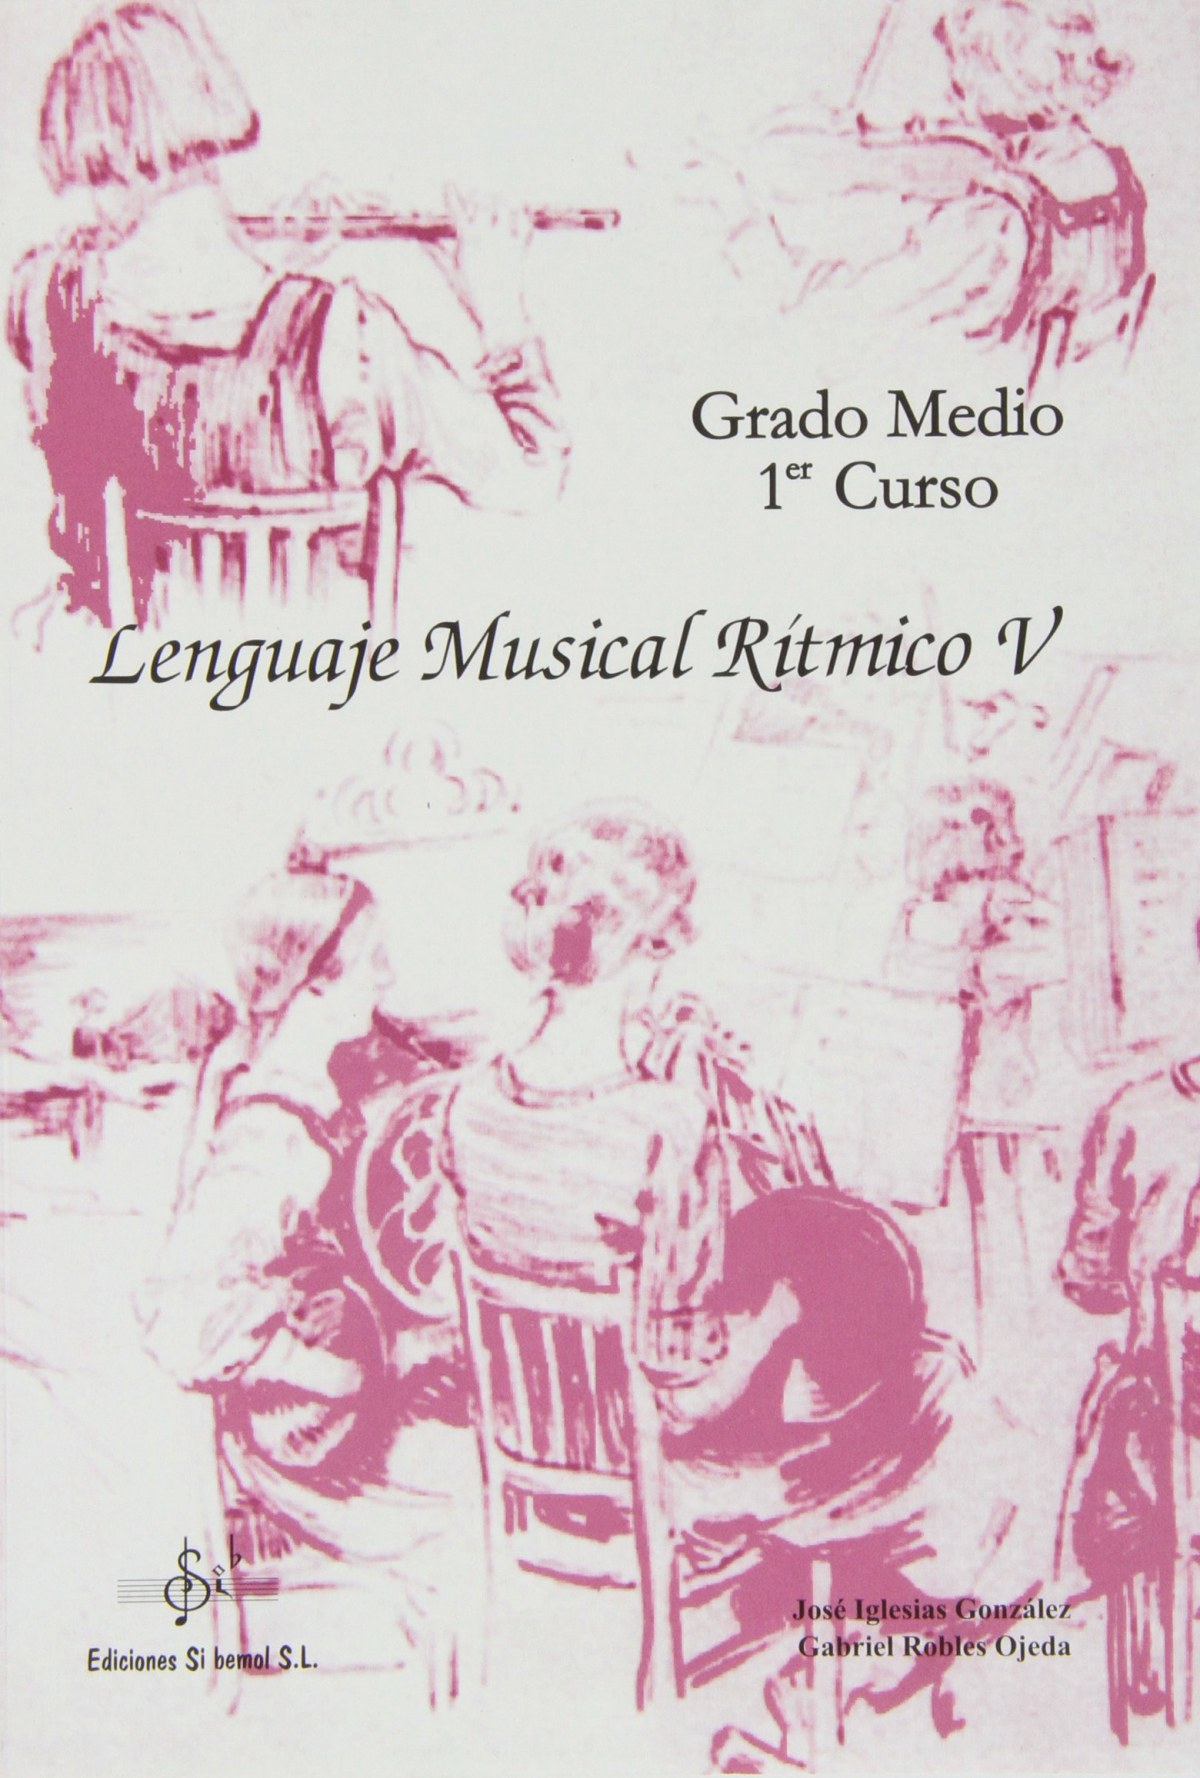 Lenguaje musical rítmico